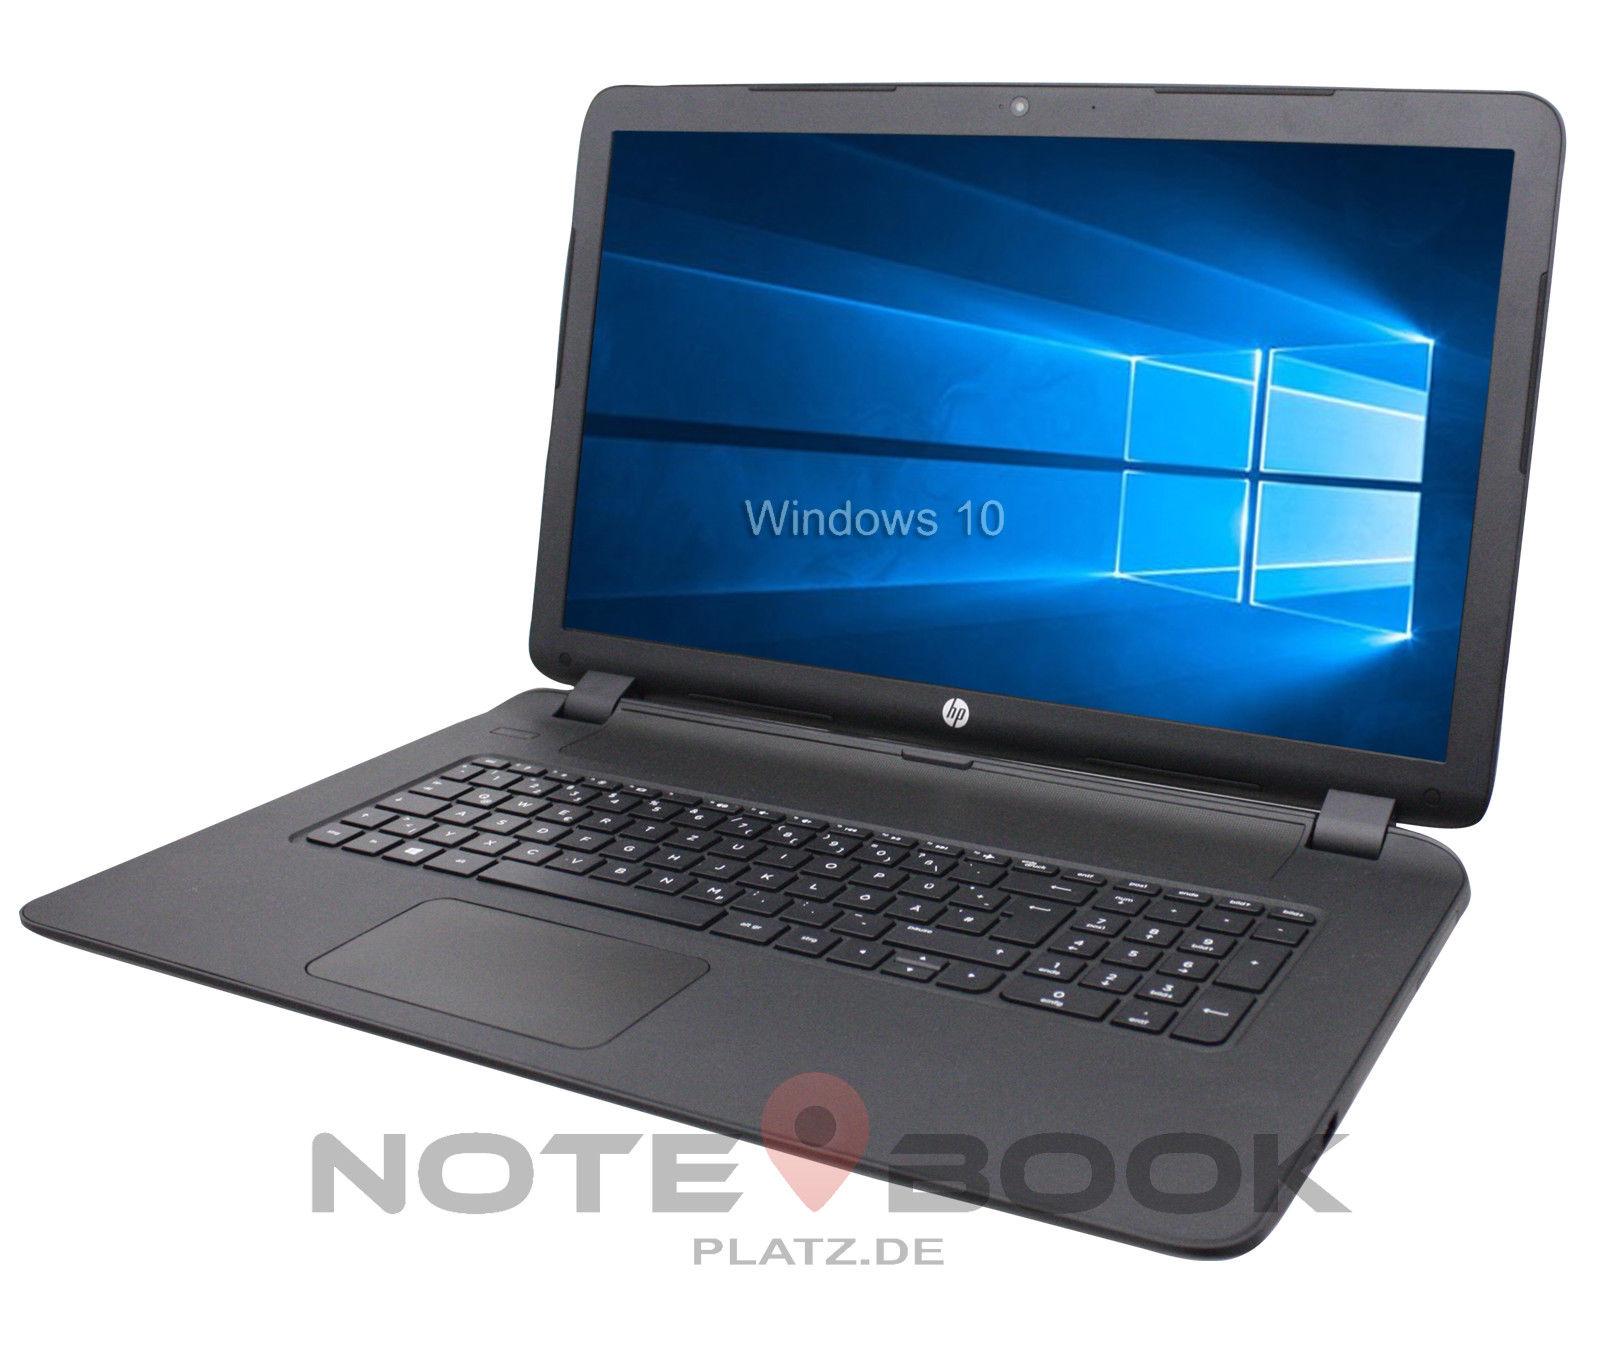 HP Notebook 17 Zoll HD+ Dual Core 2x 2,0GHz 4GB 1000GB Win10 / Office 2016